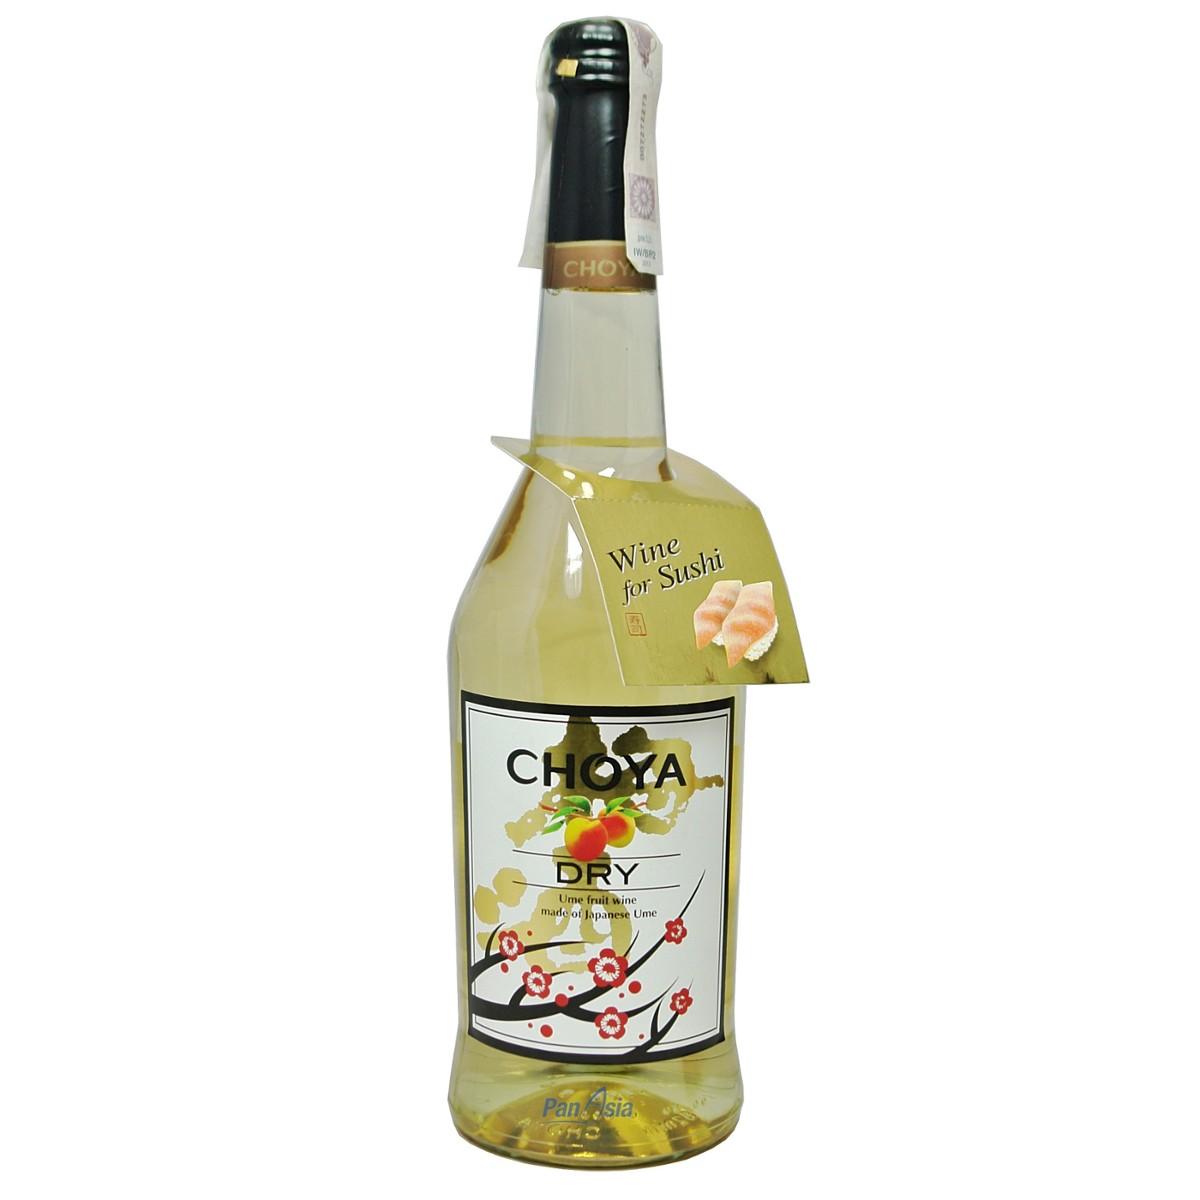 Wino Choya Wytrawne Dry 10 750ml Panasiapolska